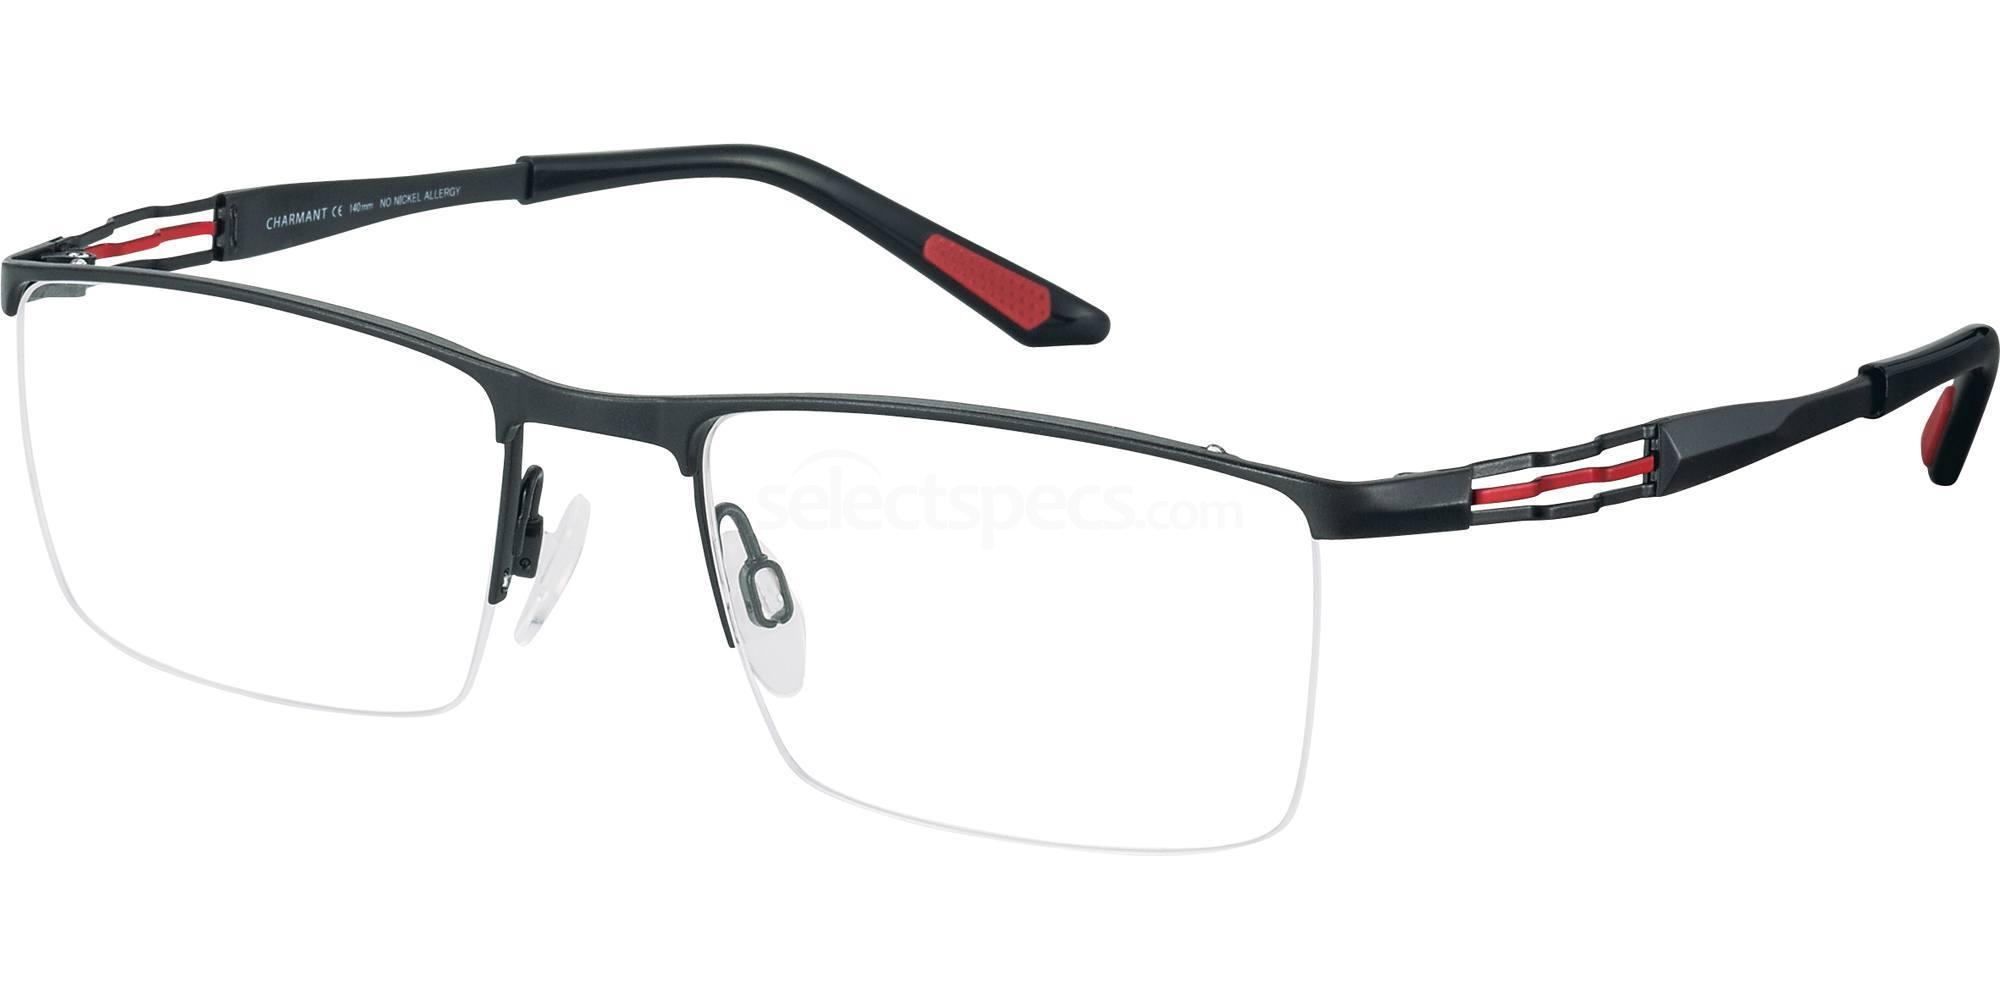 BK CH12300 Glasses, Charmant Titanium Perfection